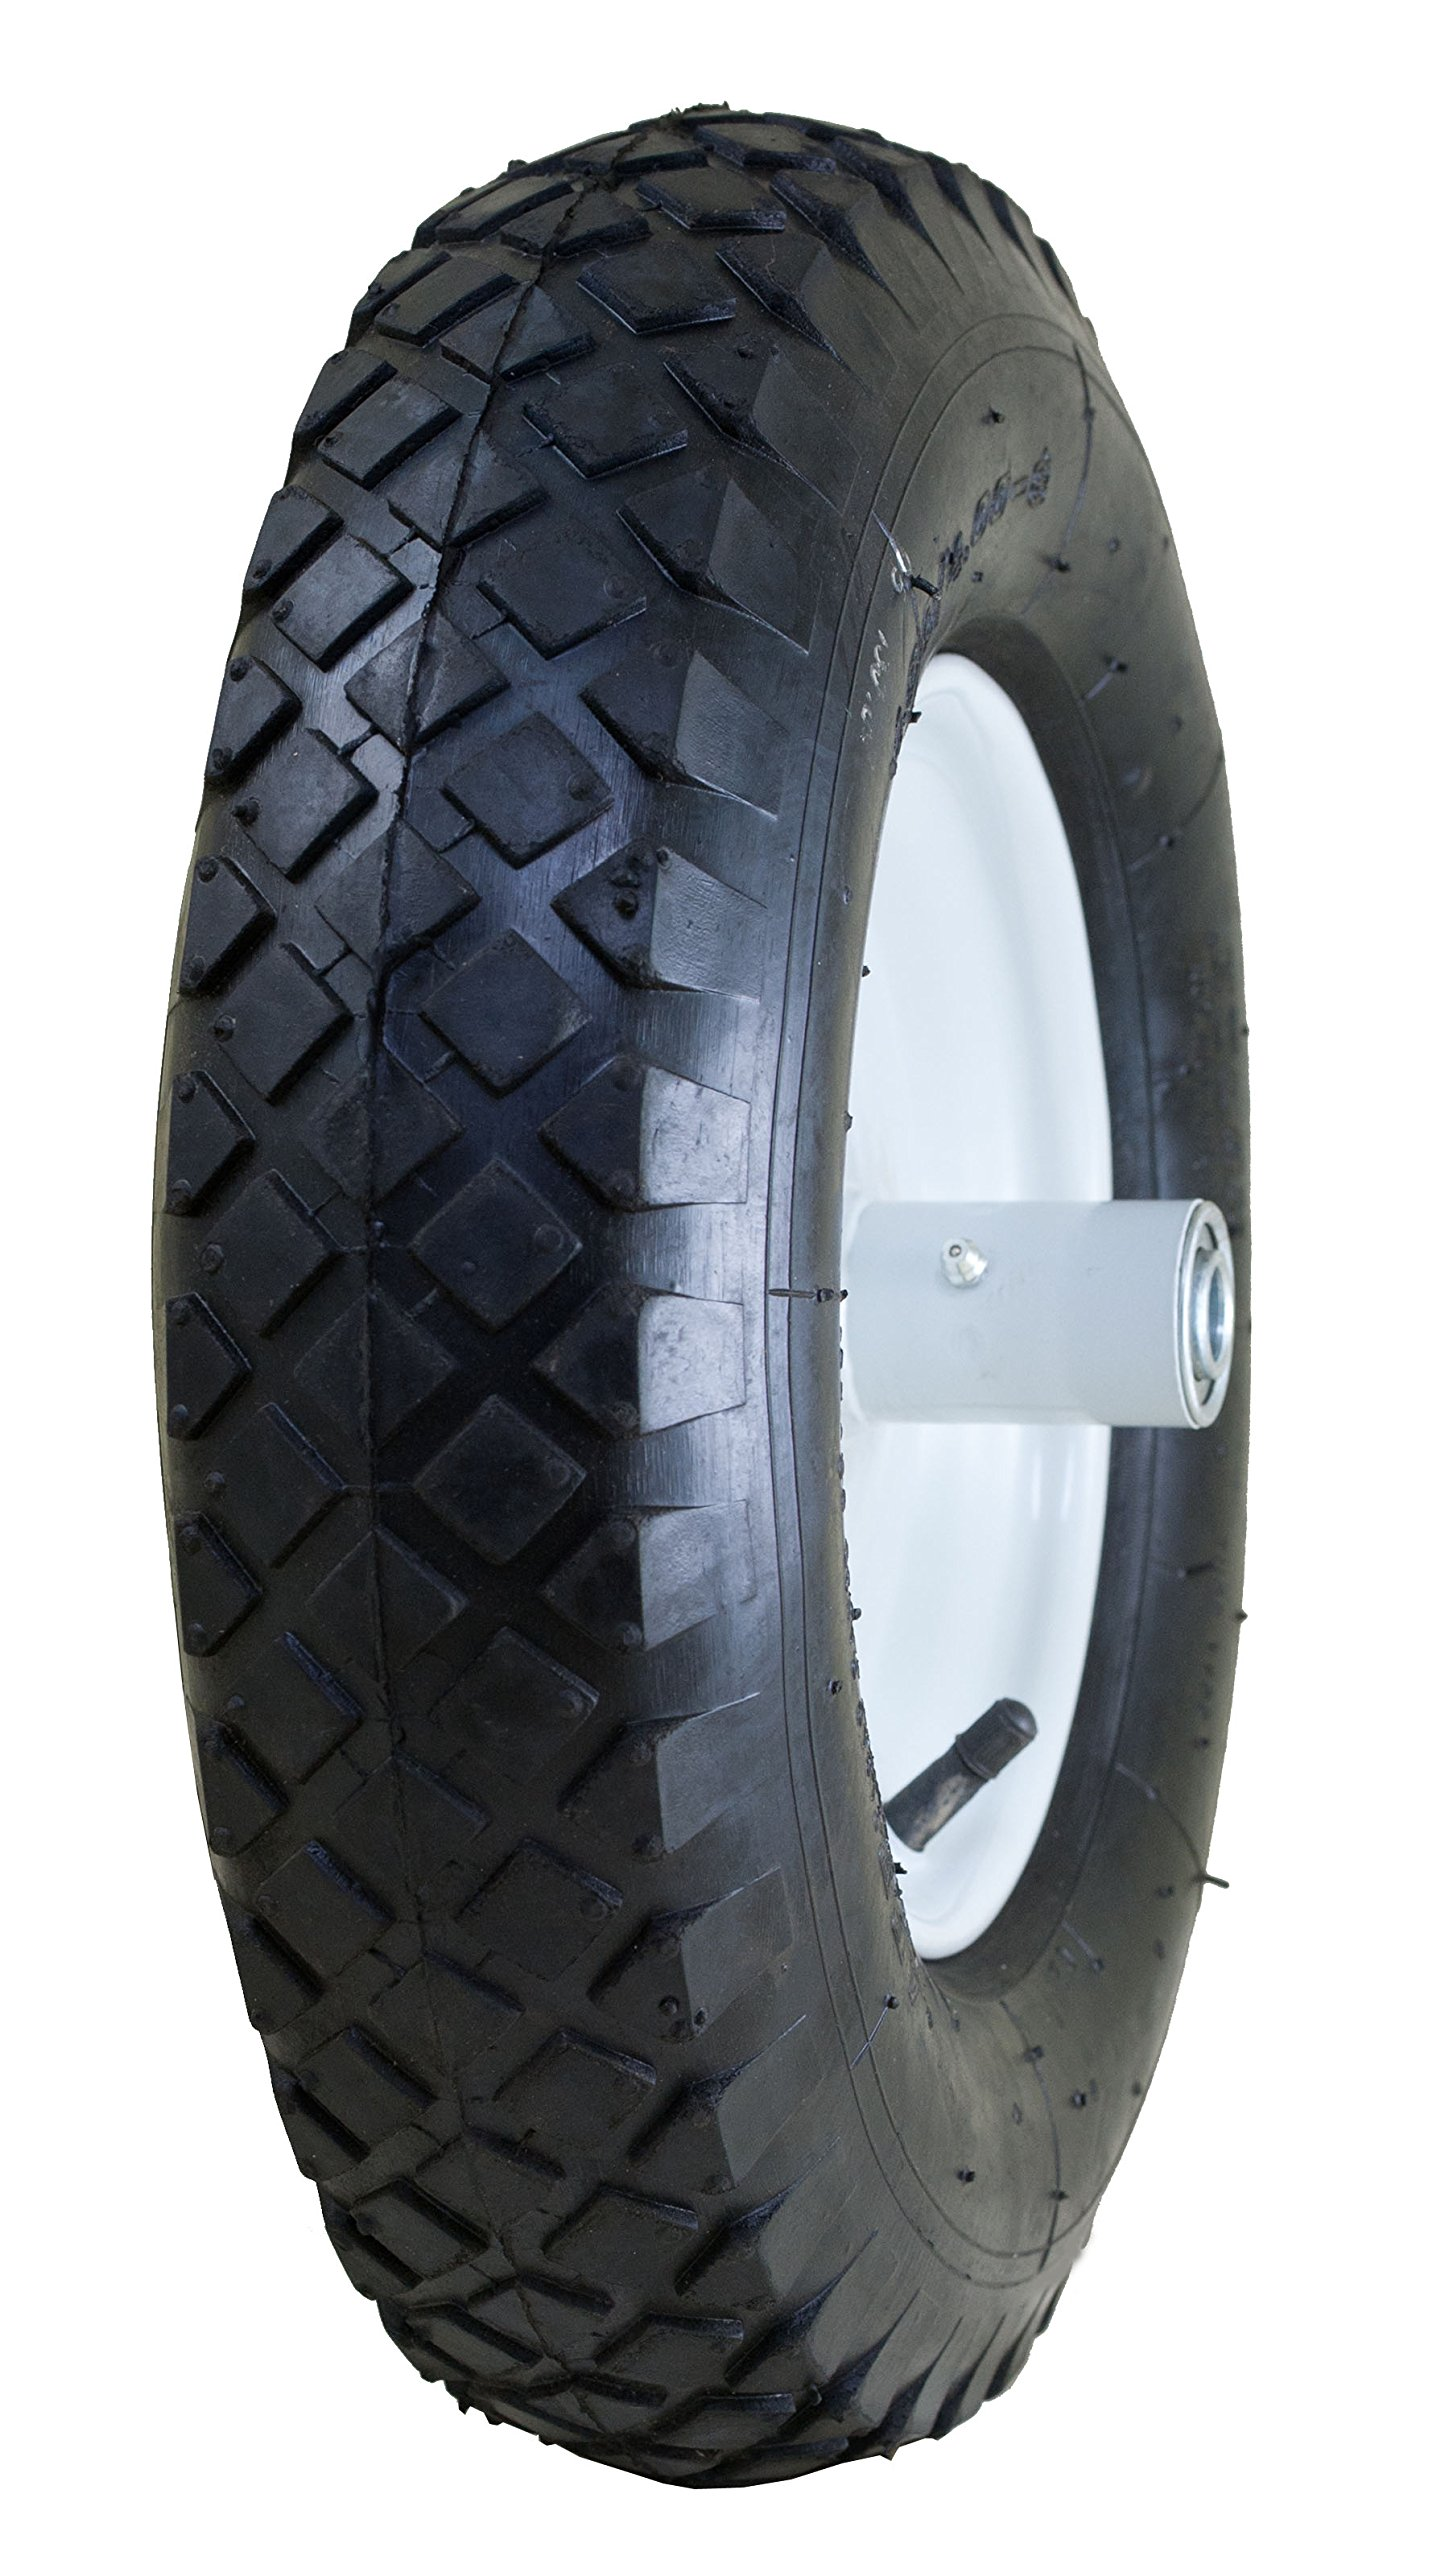 Marathon 4.80/4.00-8'' Pneumatic (Air Filled) Tire on Wheel, 6'' Hub, 5/8'' Bearings, Knobby Tread